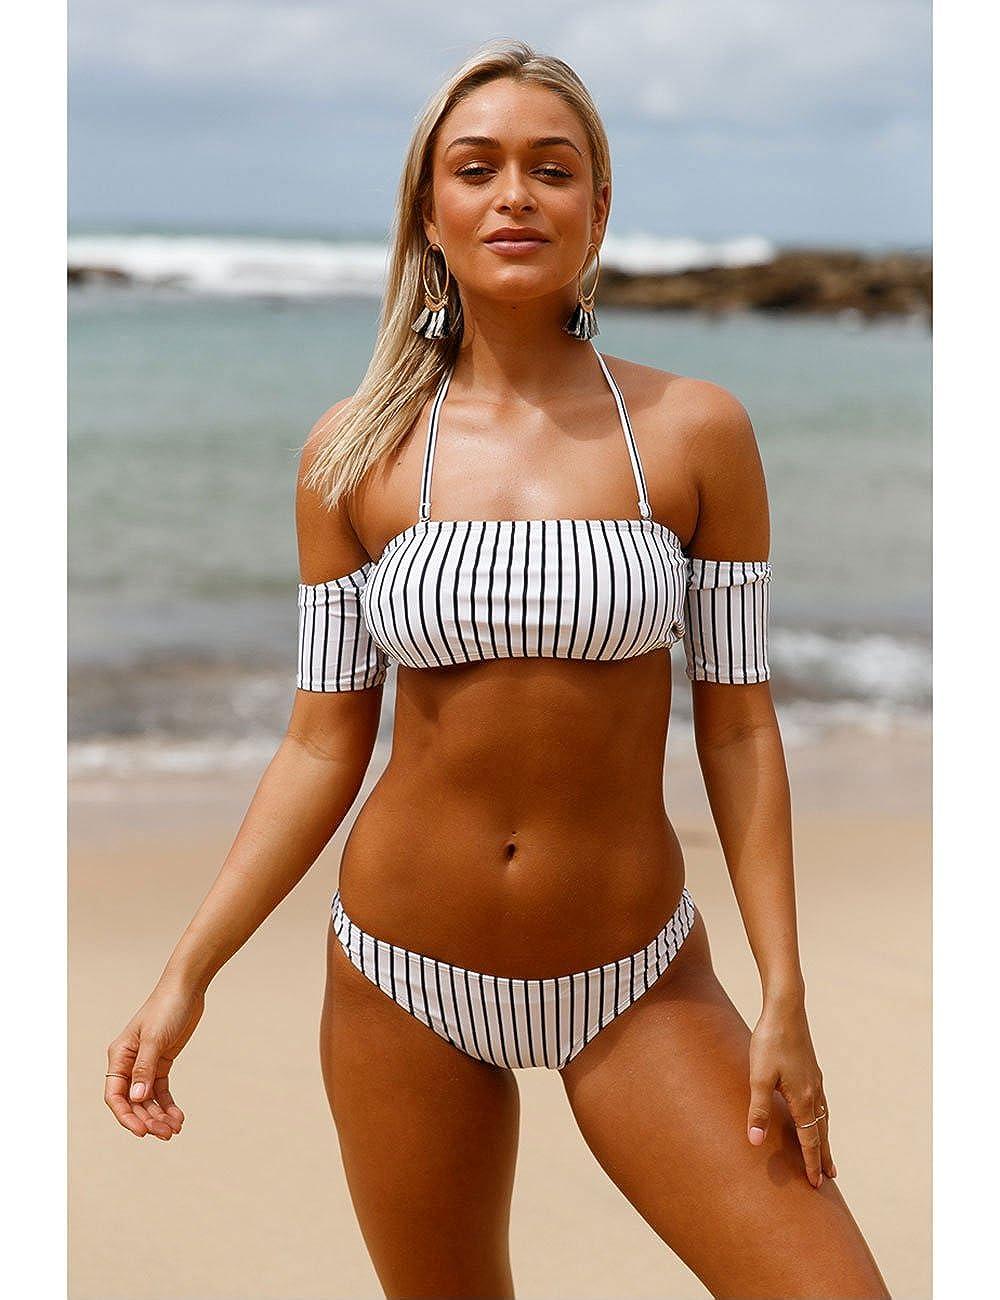 be7de7a9f3 Amazon.com: Pinkyee Shoulder Striped Bikini Swimsuit: Clothing